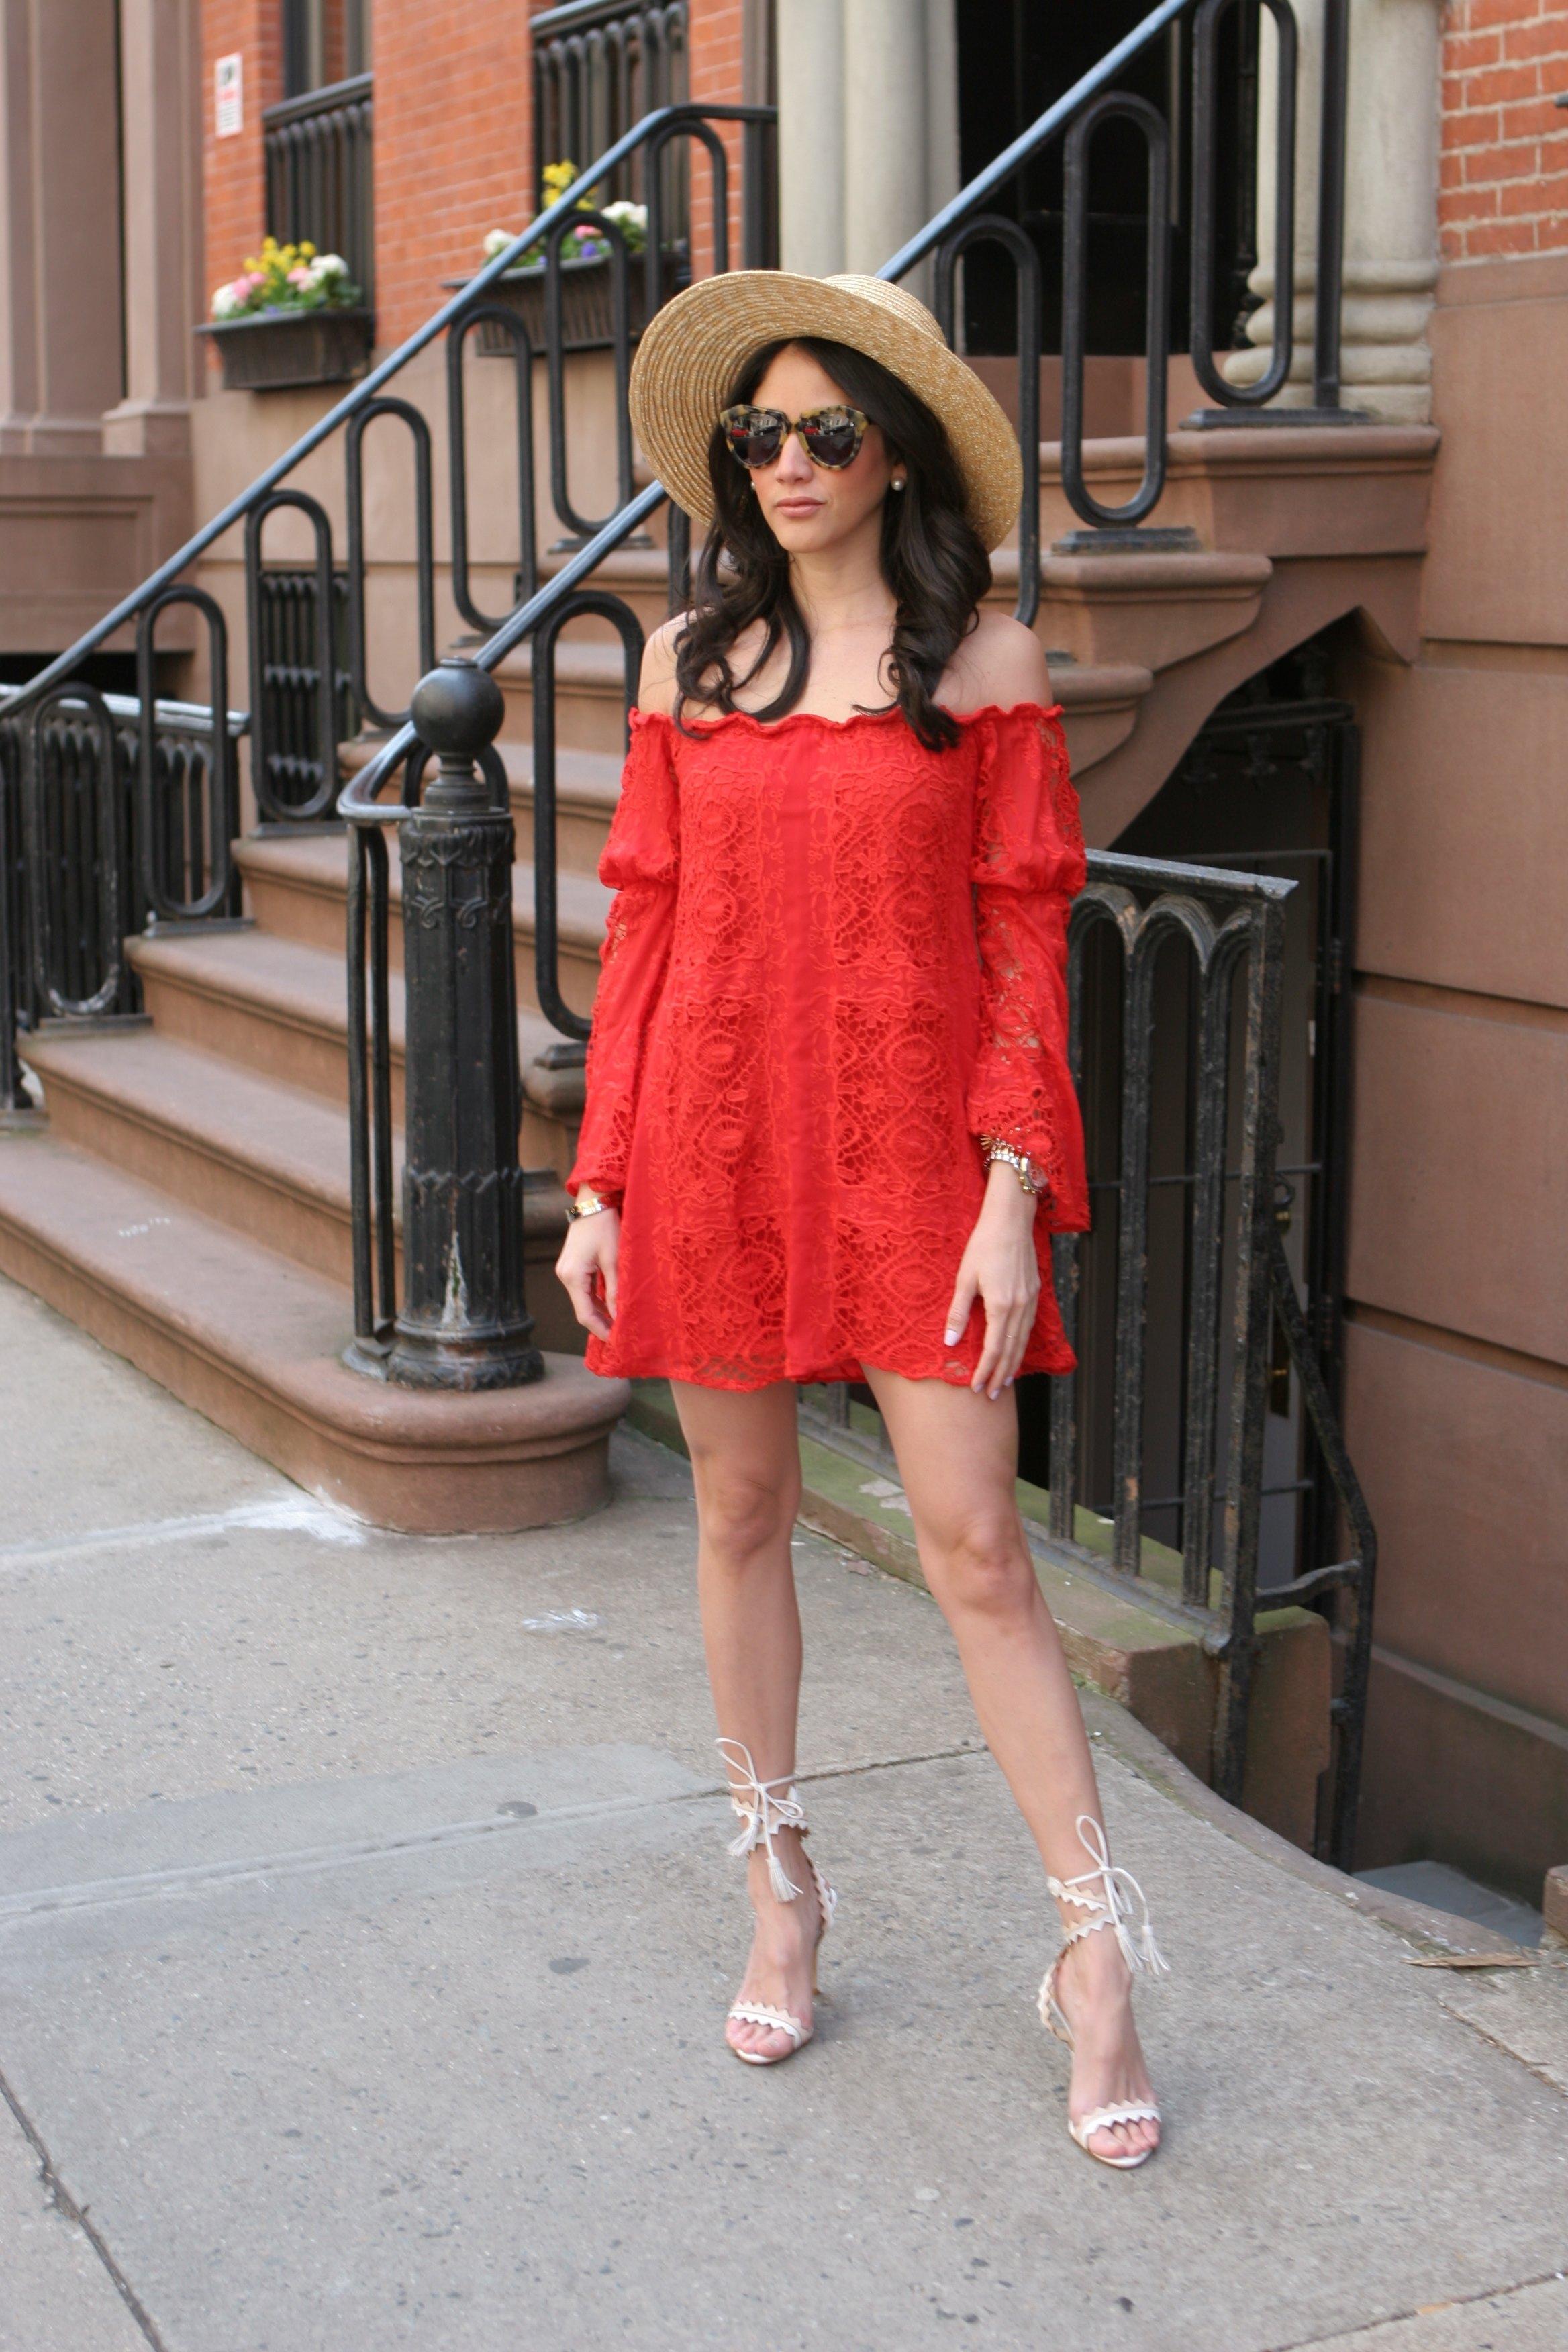 Платье в стиле бохо - фото новинки сезона